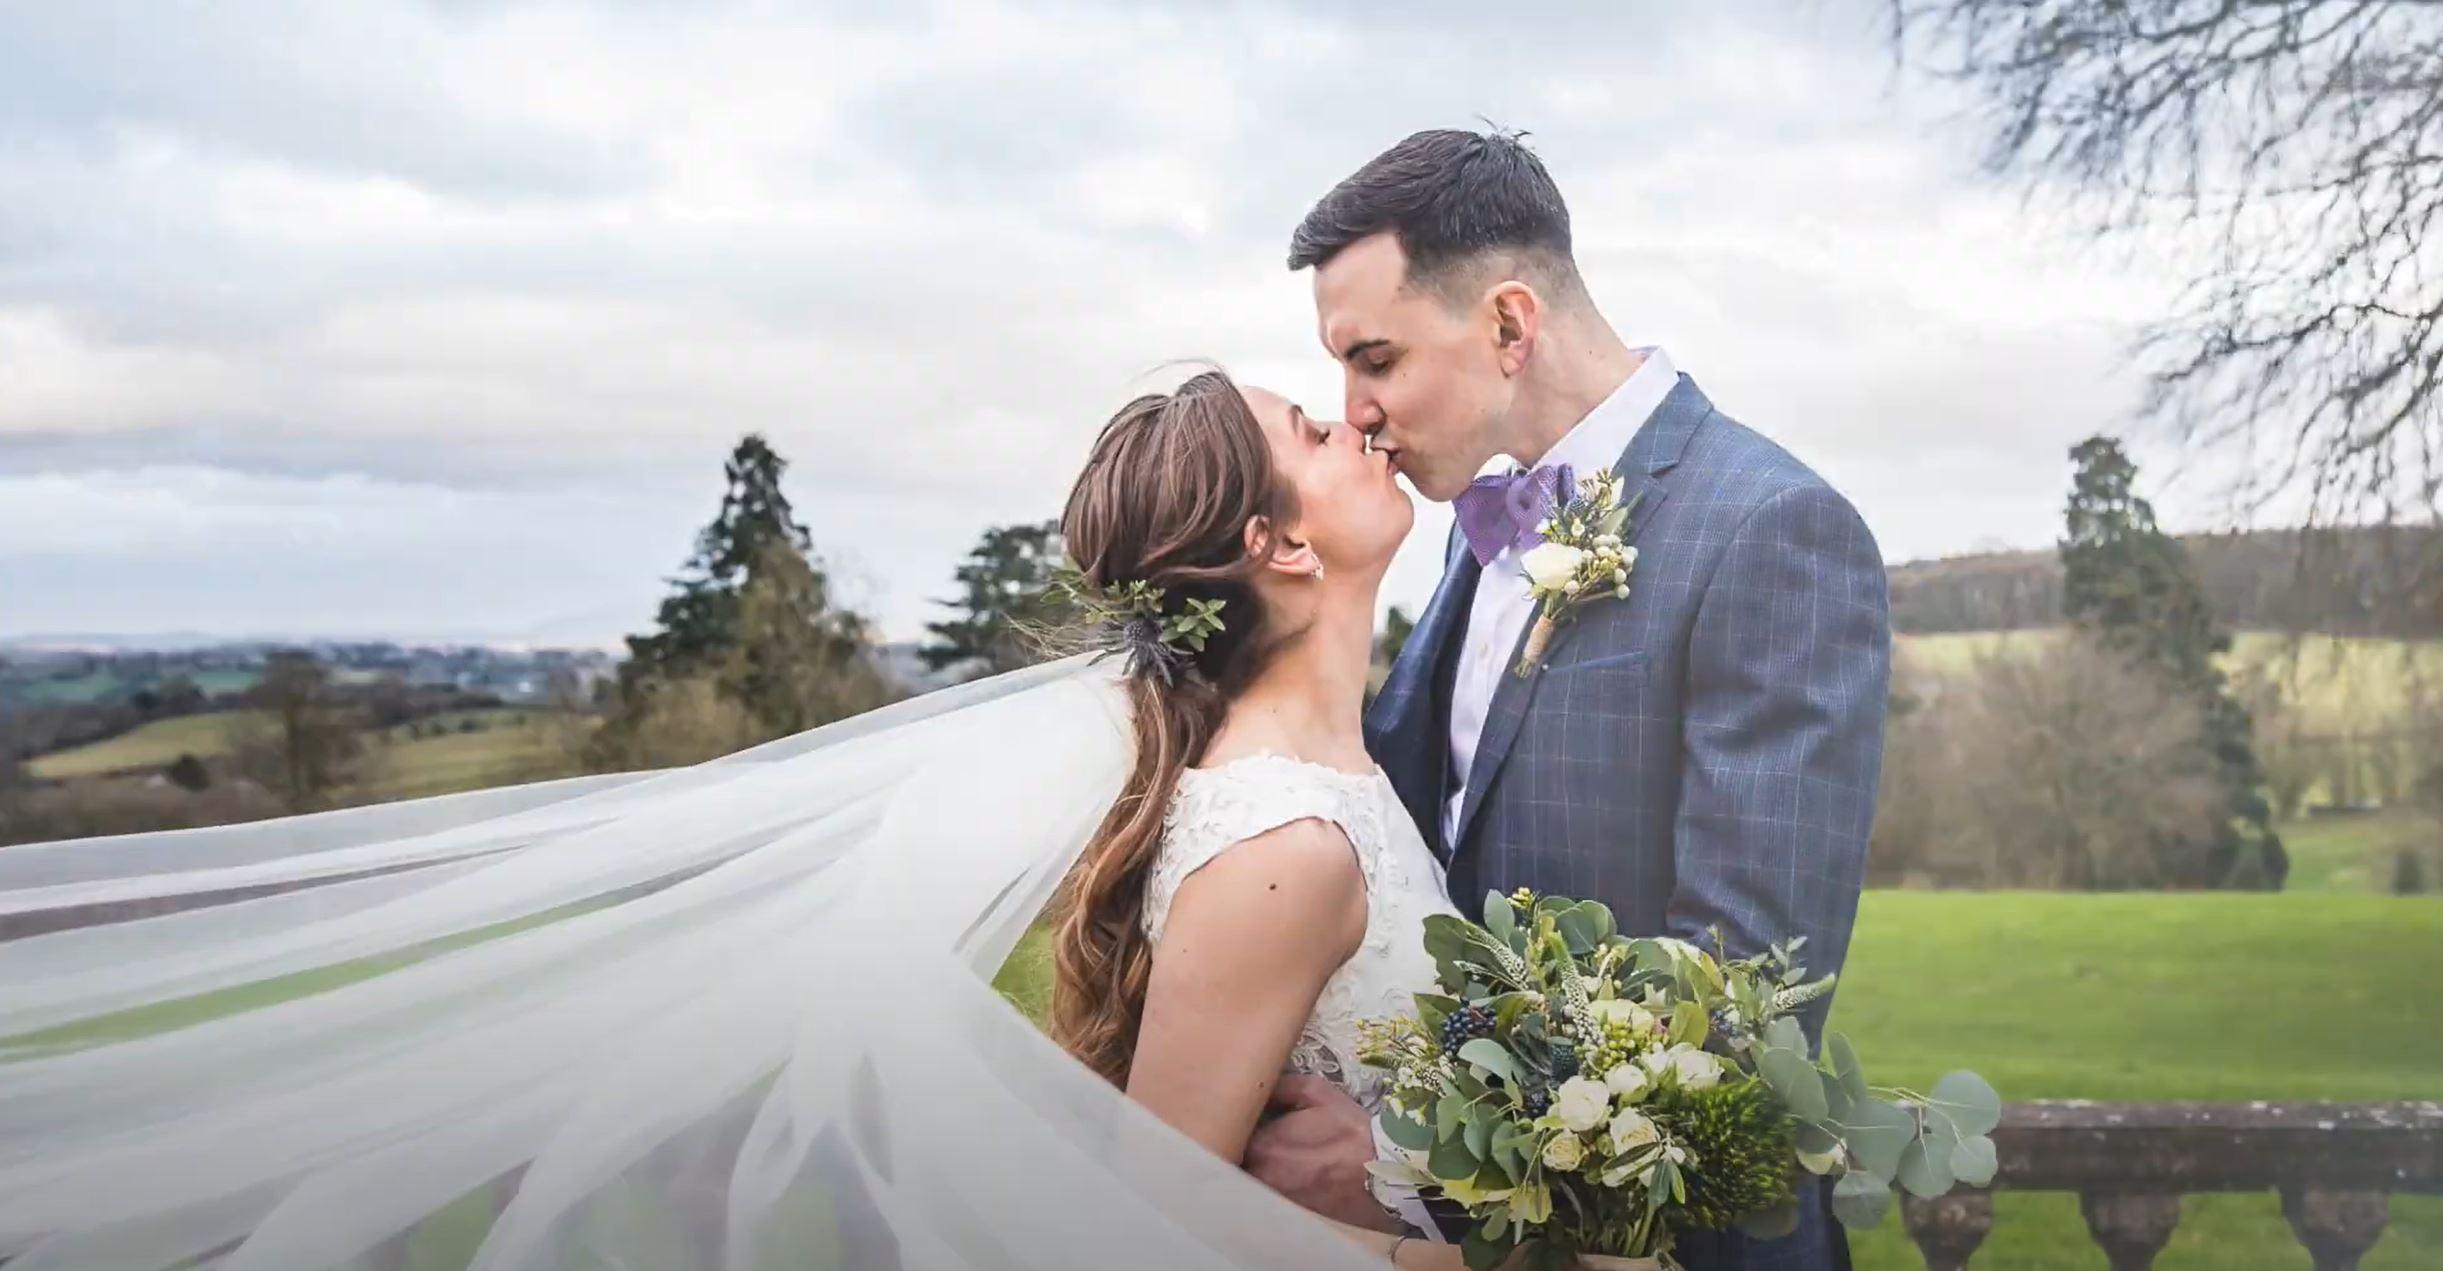 Mr & Mrs Laight's Wedding Video